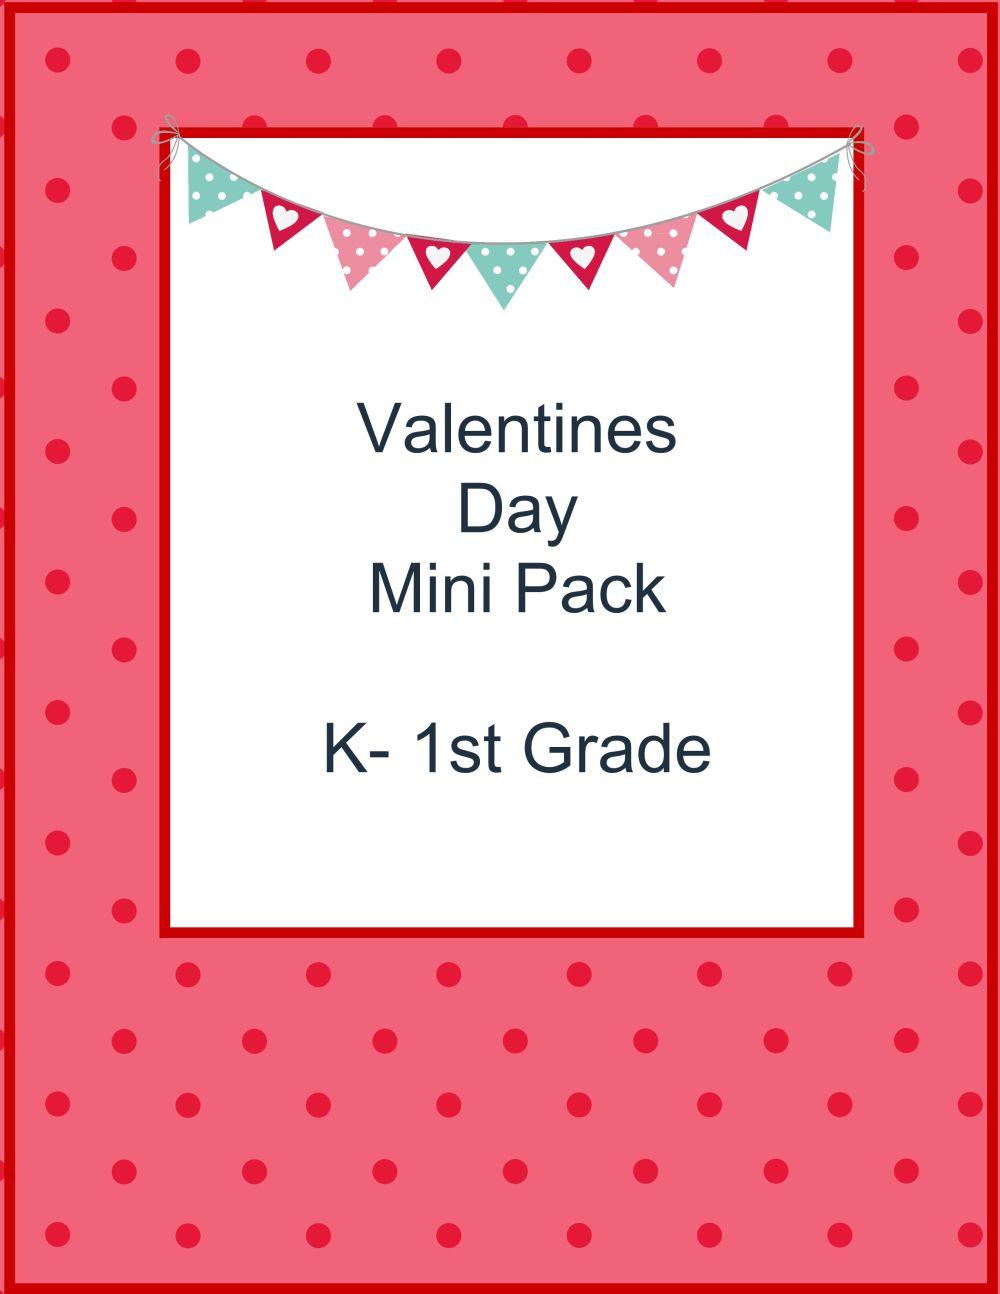 medium resolution of FREE Valentines Day Mini Pack